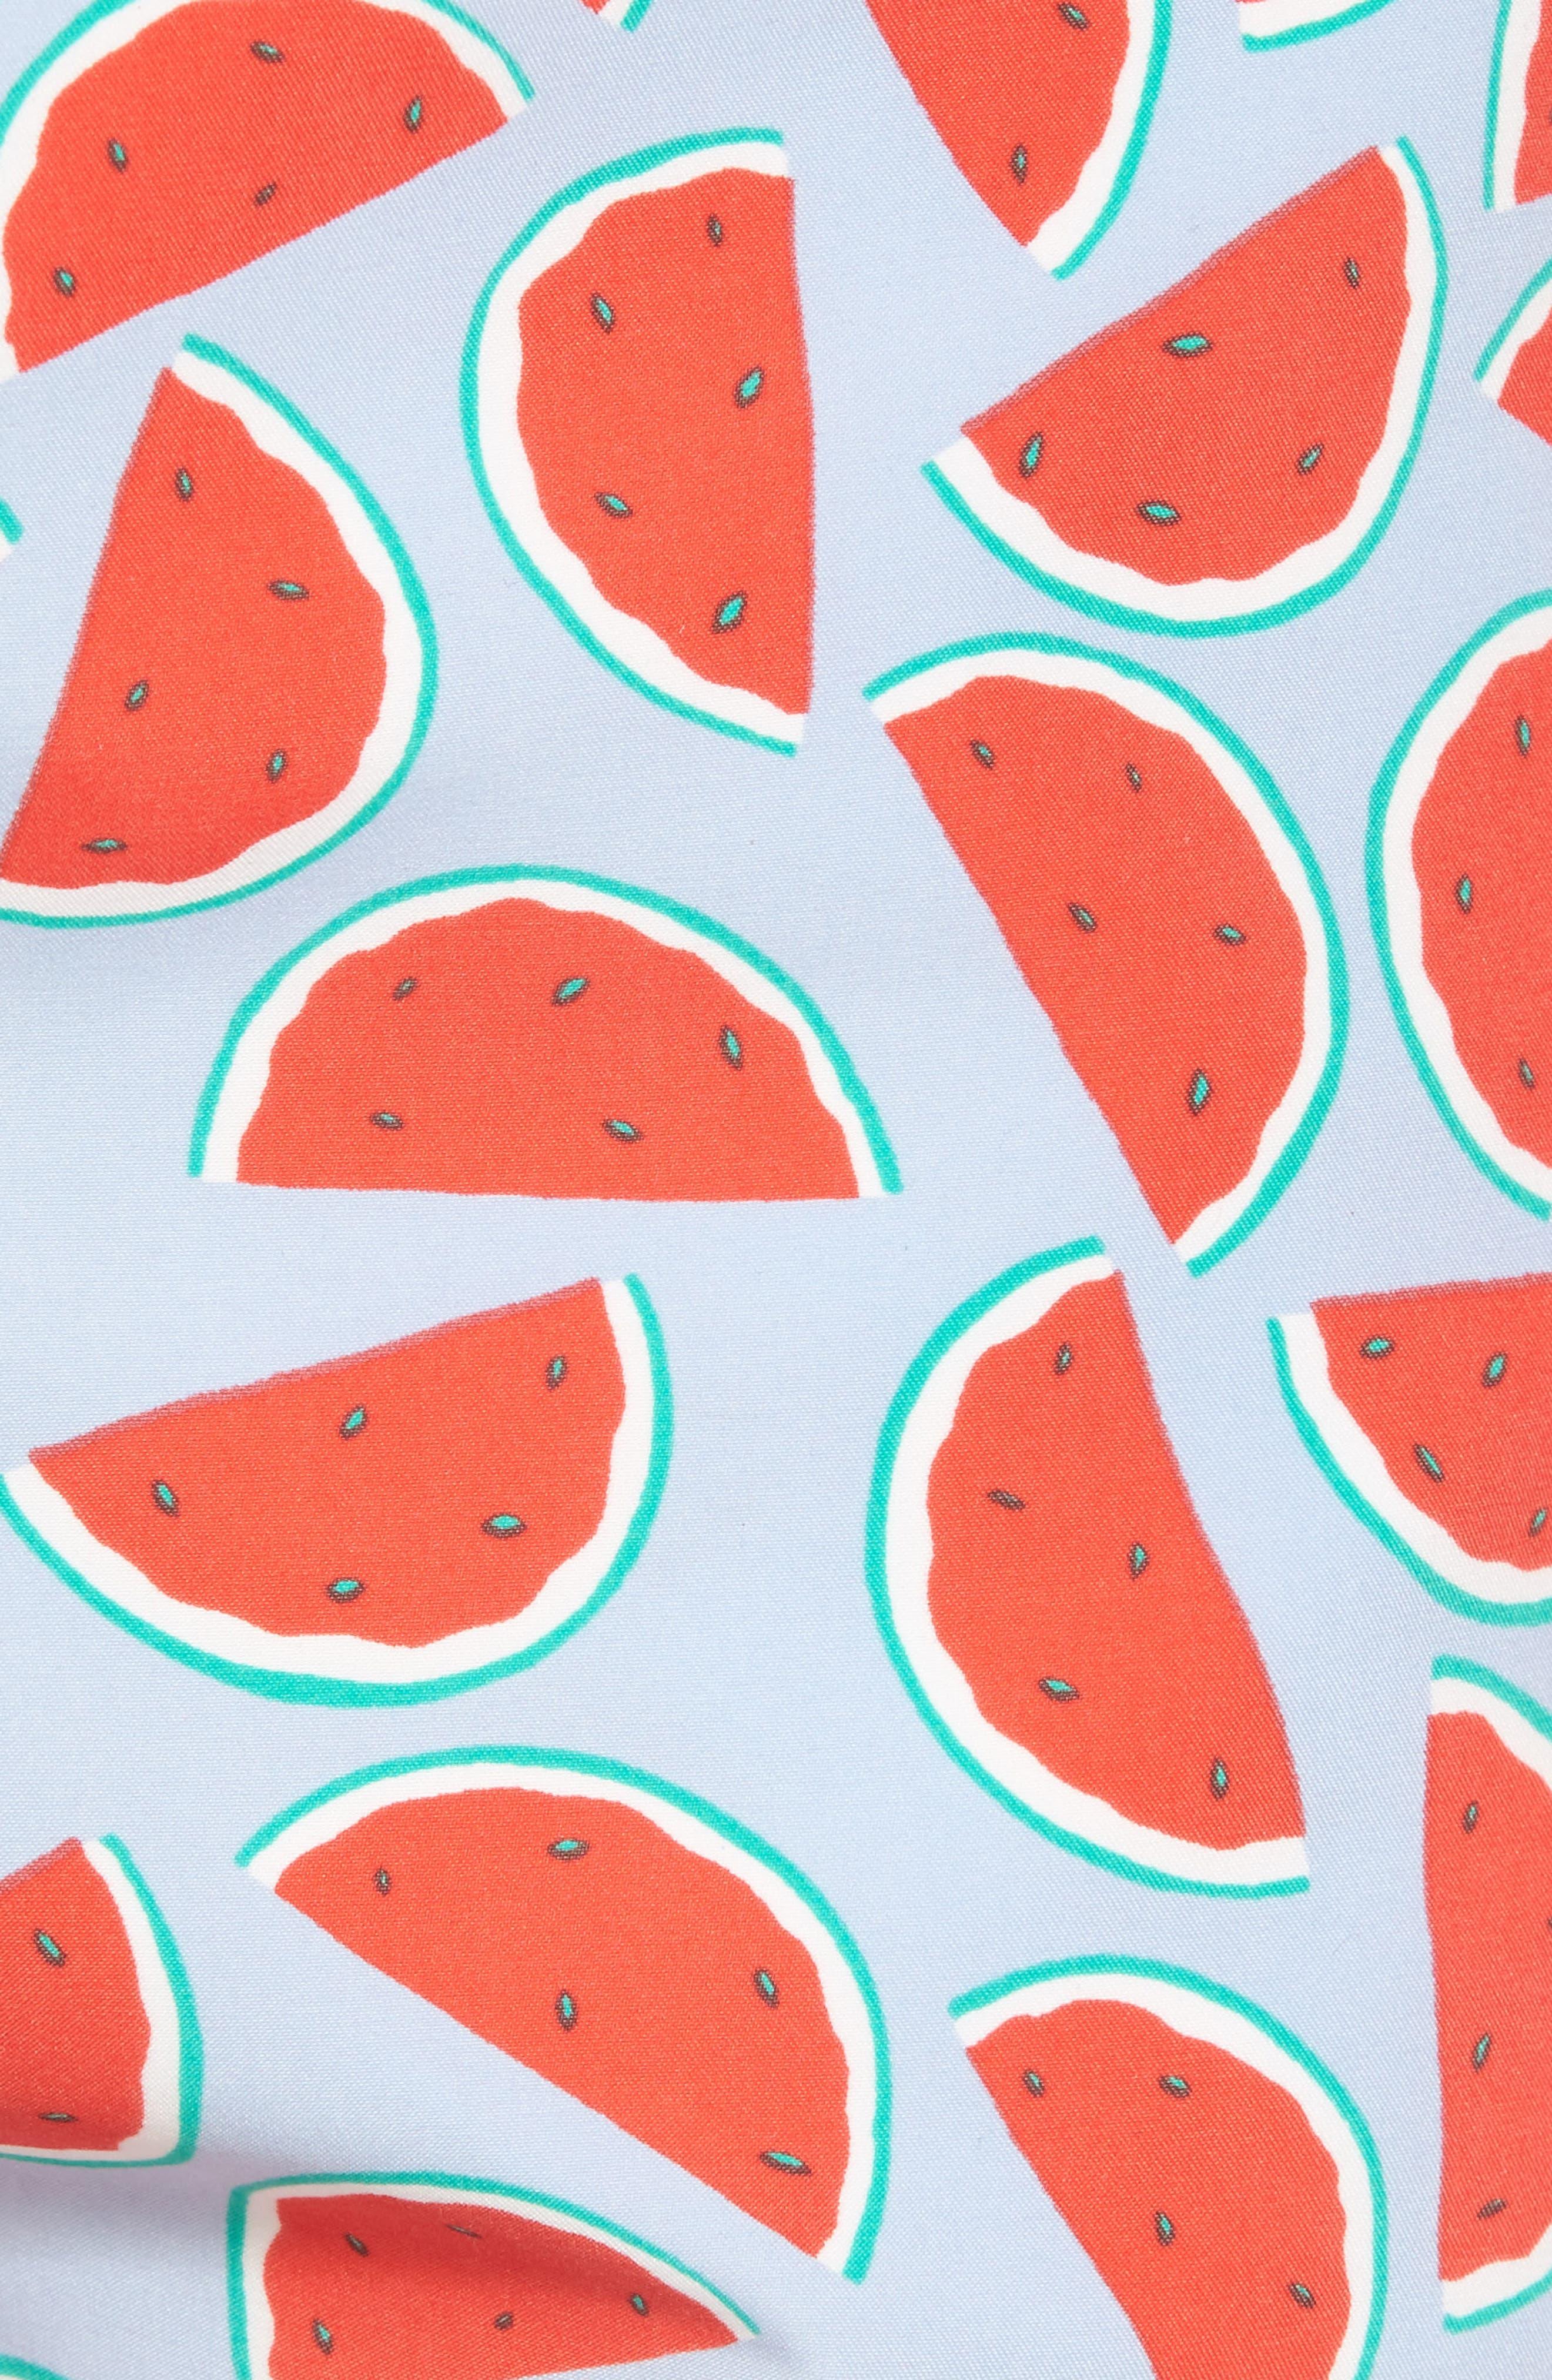 Watermelon Print Swim Trunks,                             Alternate thumbnail 5, color,                             Red